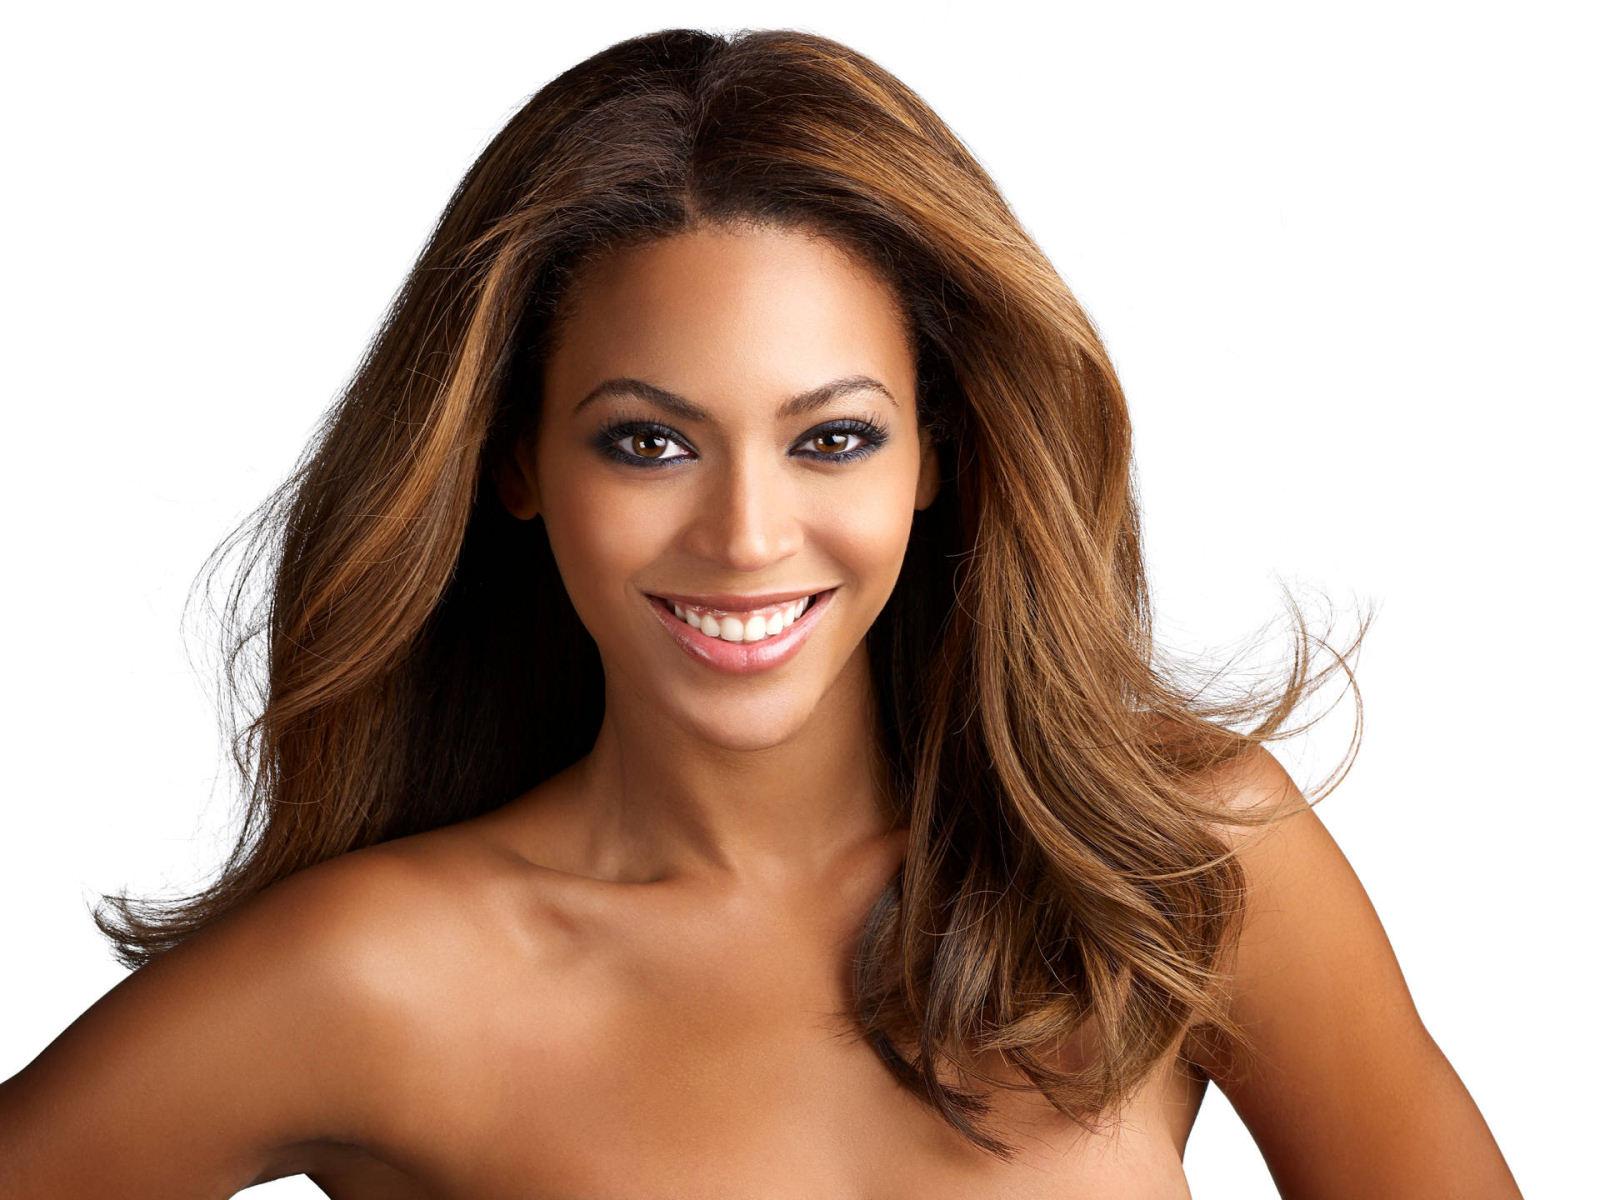 http://4.bp.blogspot.com/-H6XlsdsWixc/TaaJphfJz1I/AAAAAAAAAAg/RxMd-yPvnTI/s1600/Beyonce-005-1600x1200.jpg